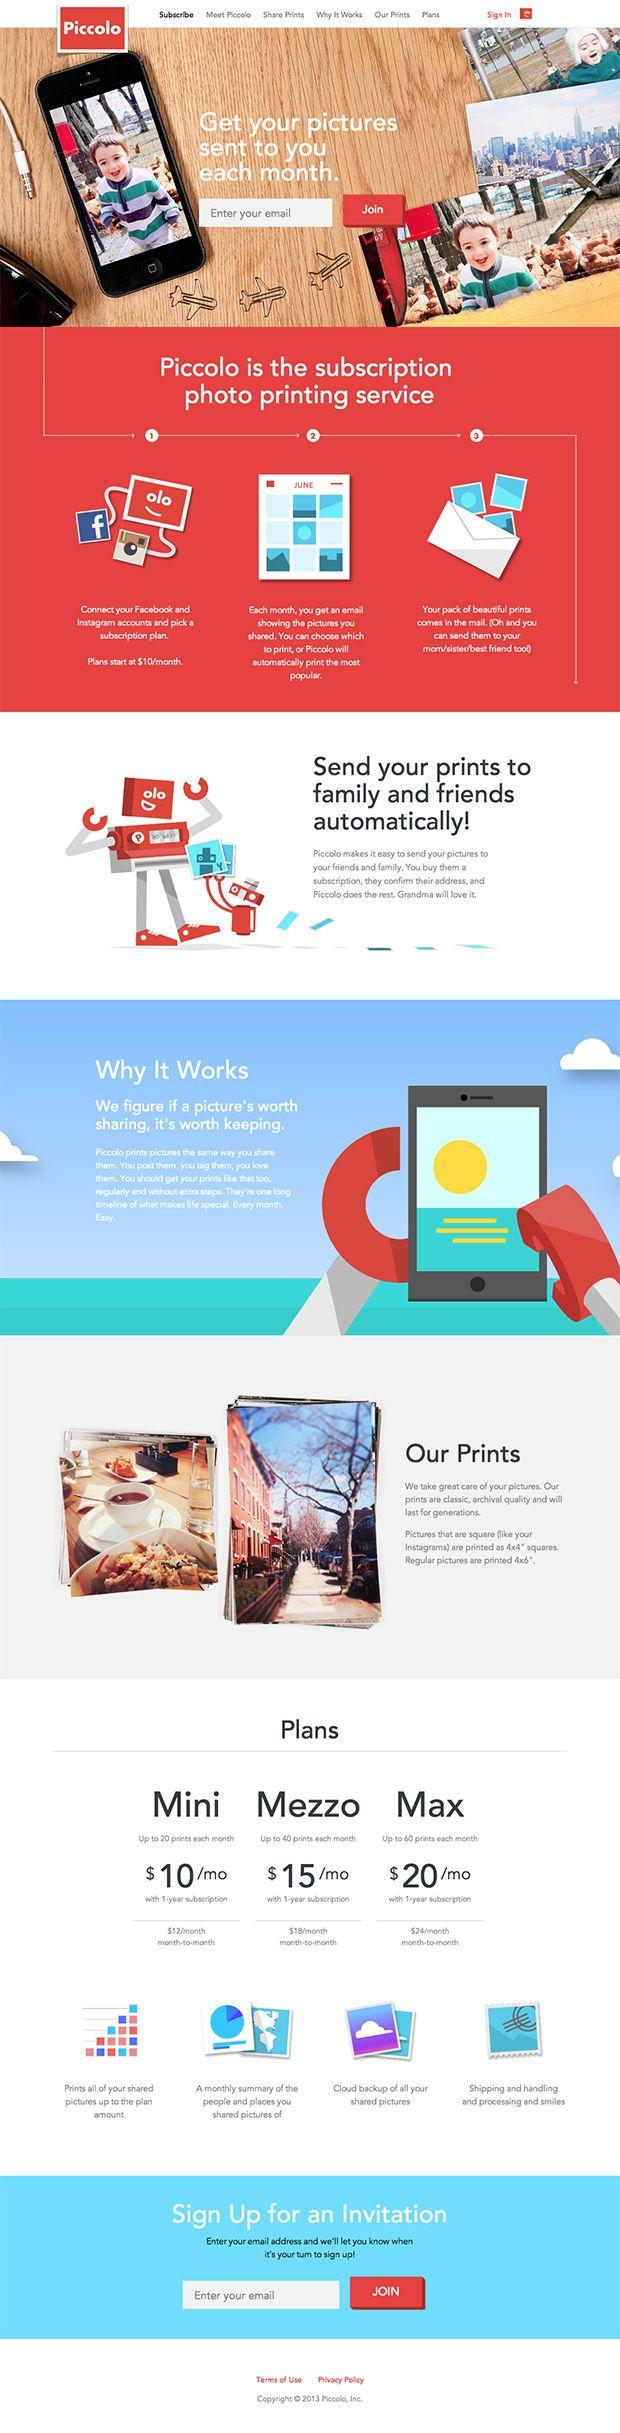 Piccolo Landing Page #landing #website #web #marketing